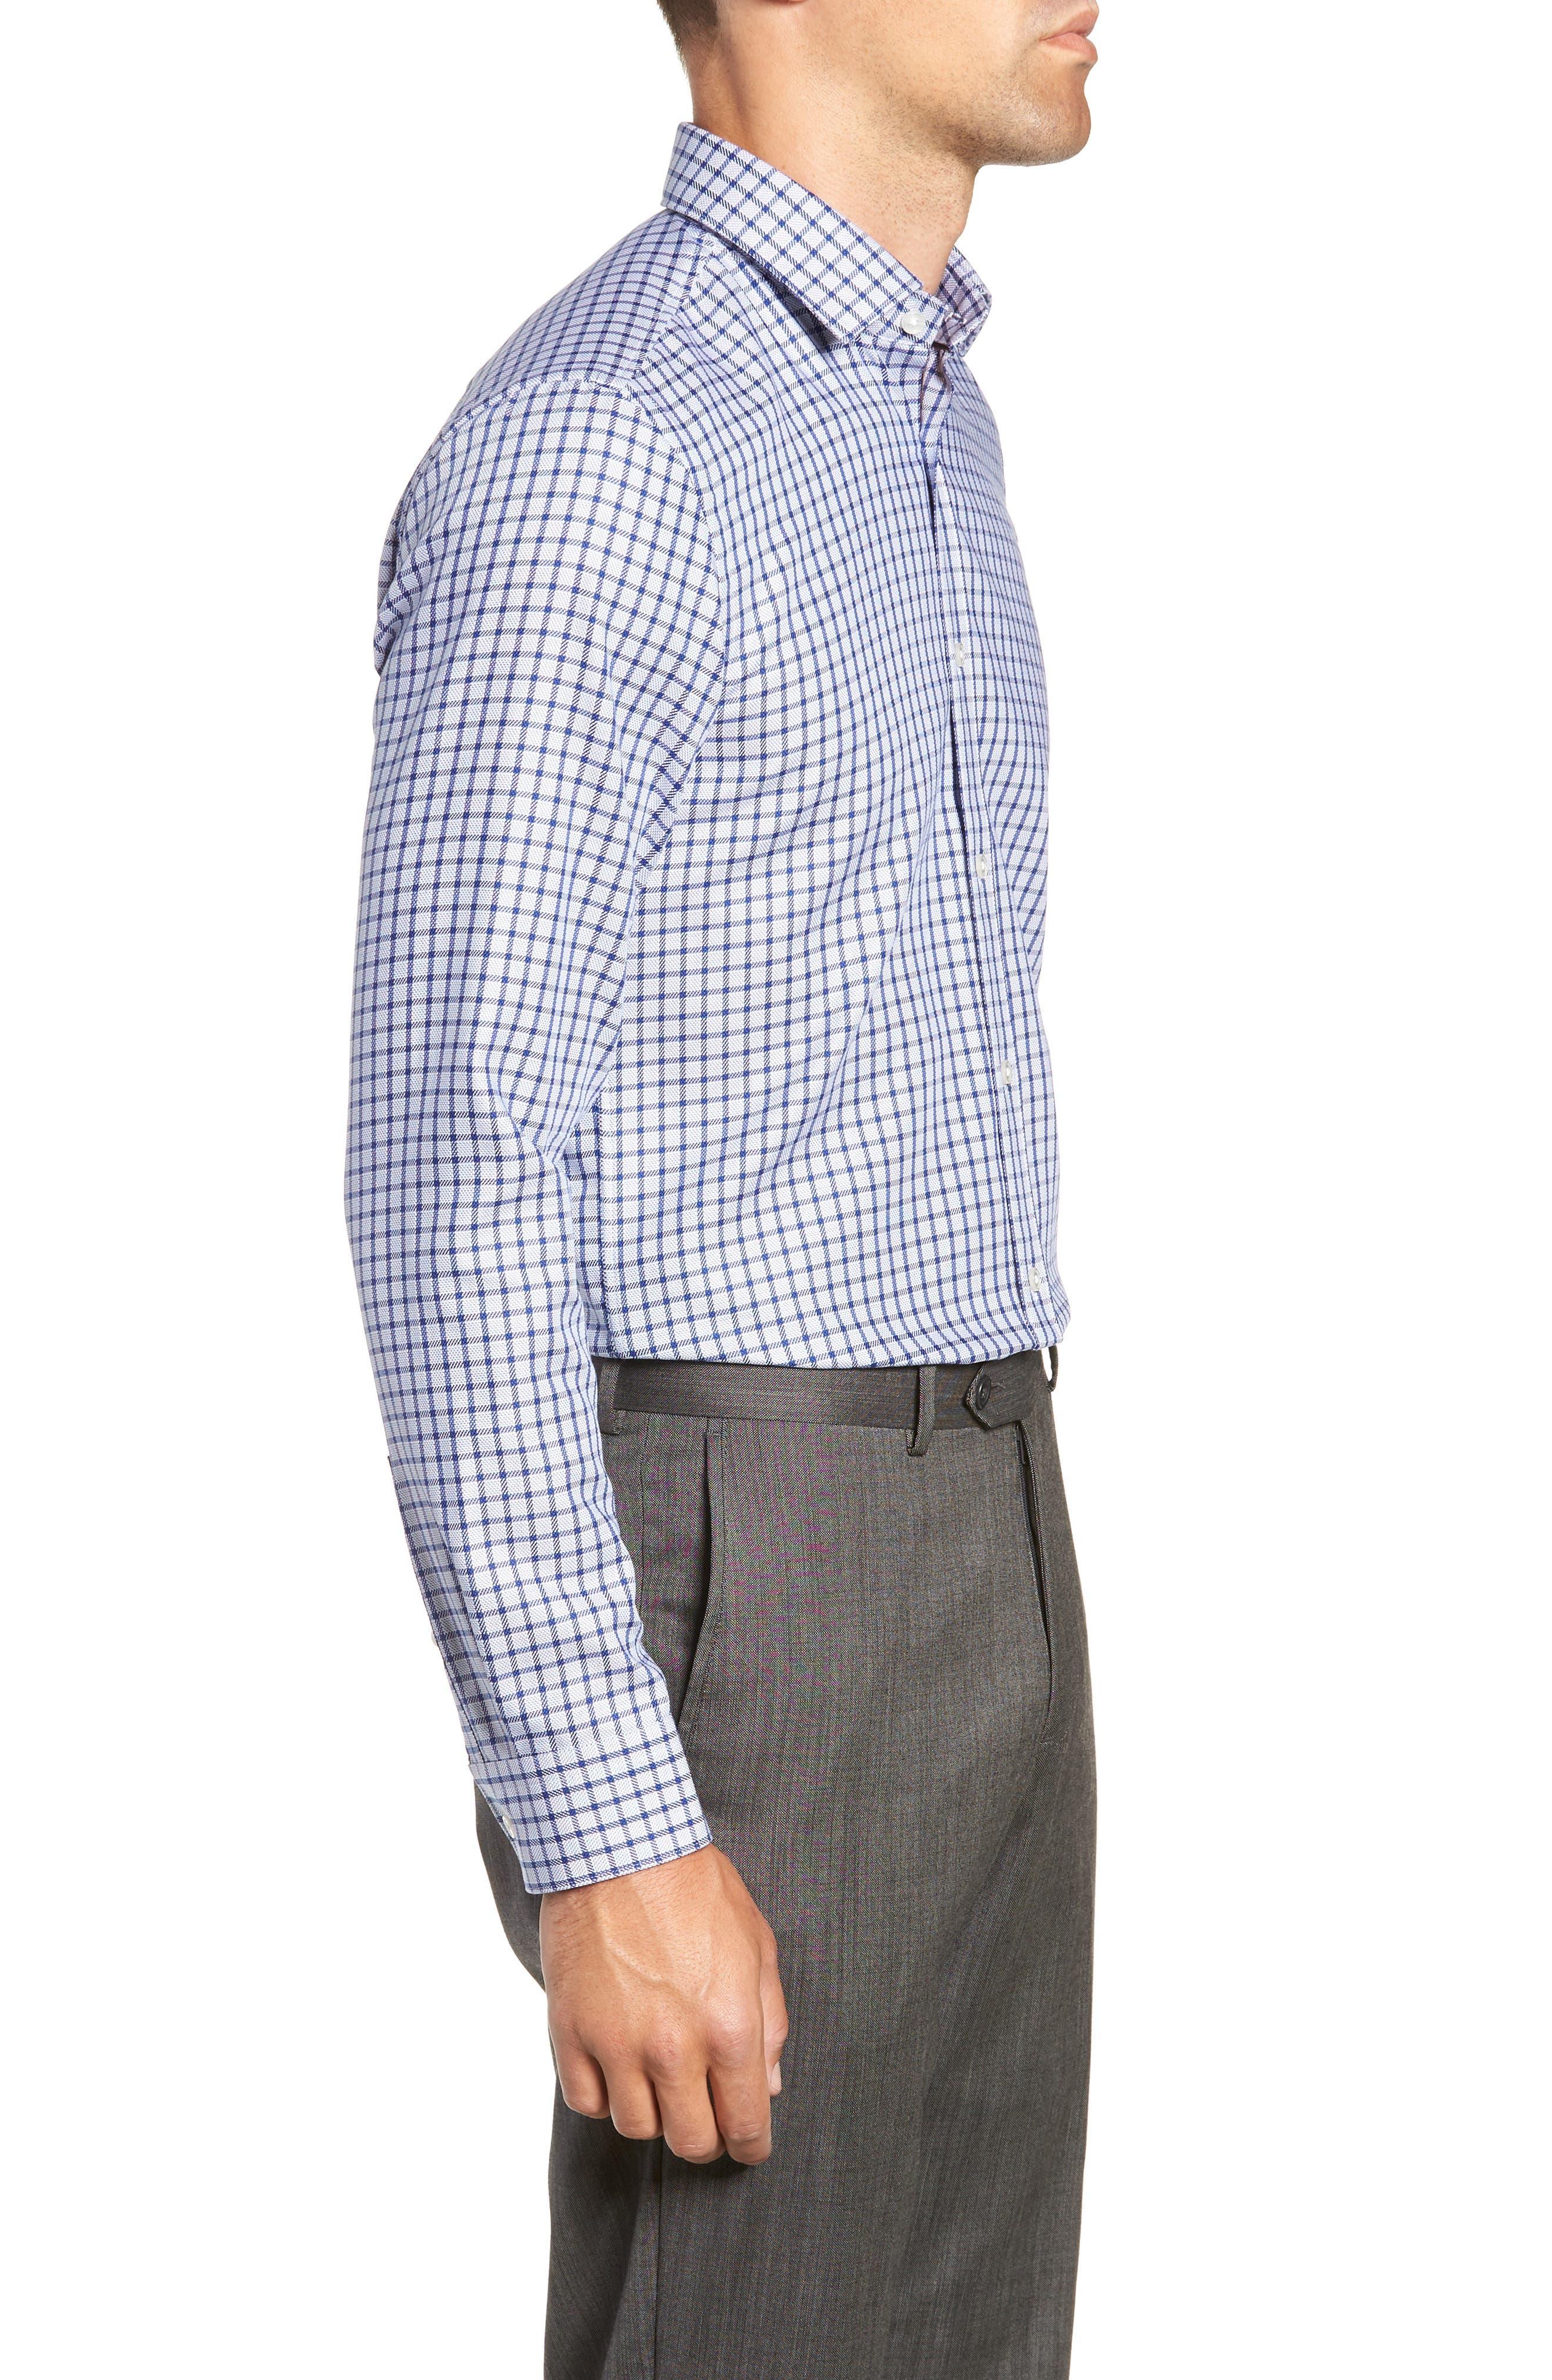 x Nordstrom Isaac Slim Fit Check Dress Shirt,                             Alternate thumbnail 4, color,                             BLUE